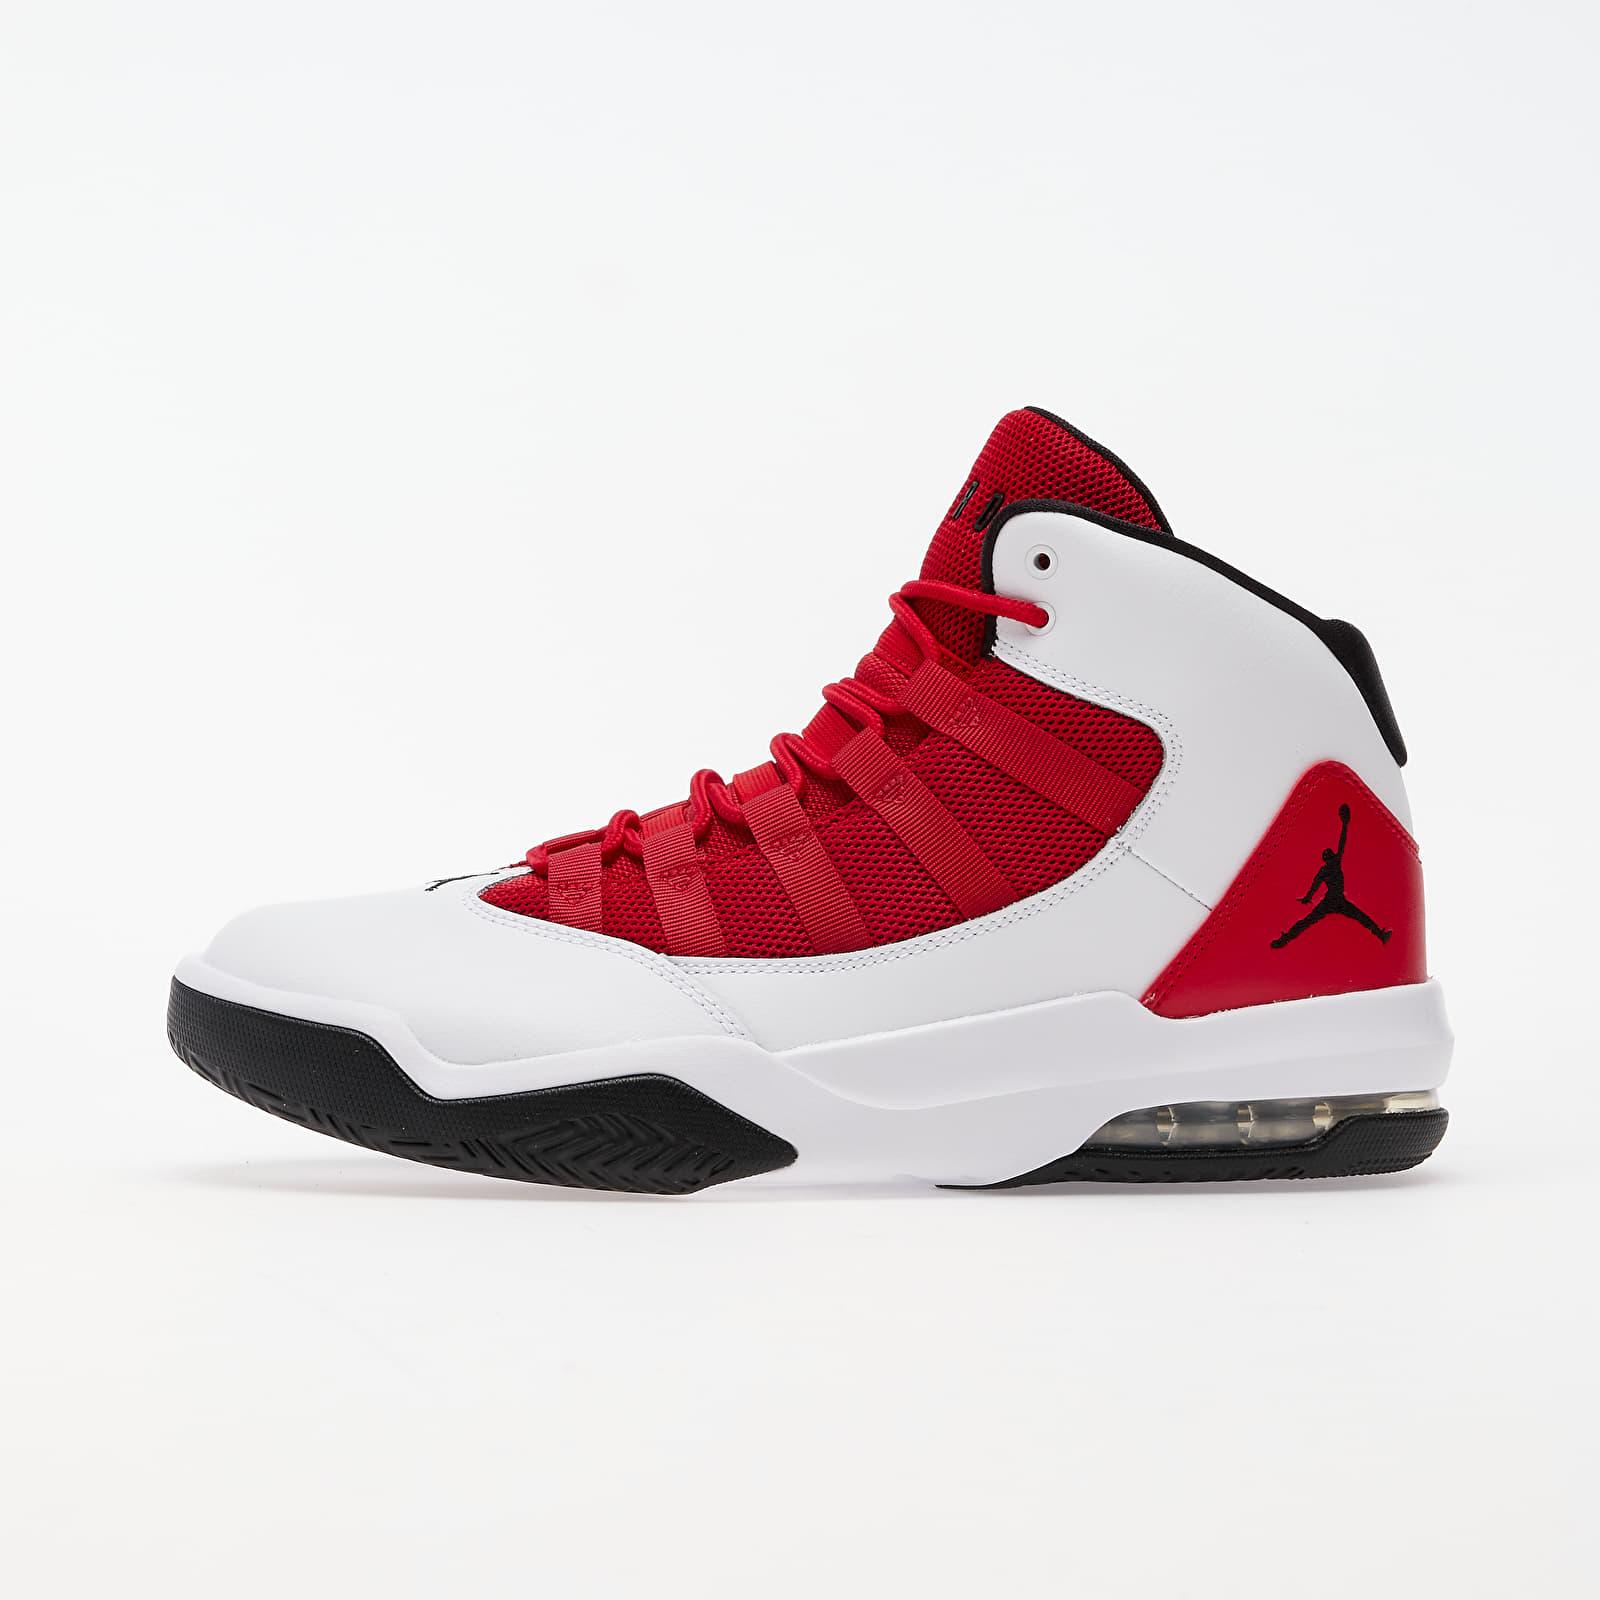 Men's shoes Jordan Max Aura White/ Black-Gym Red